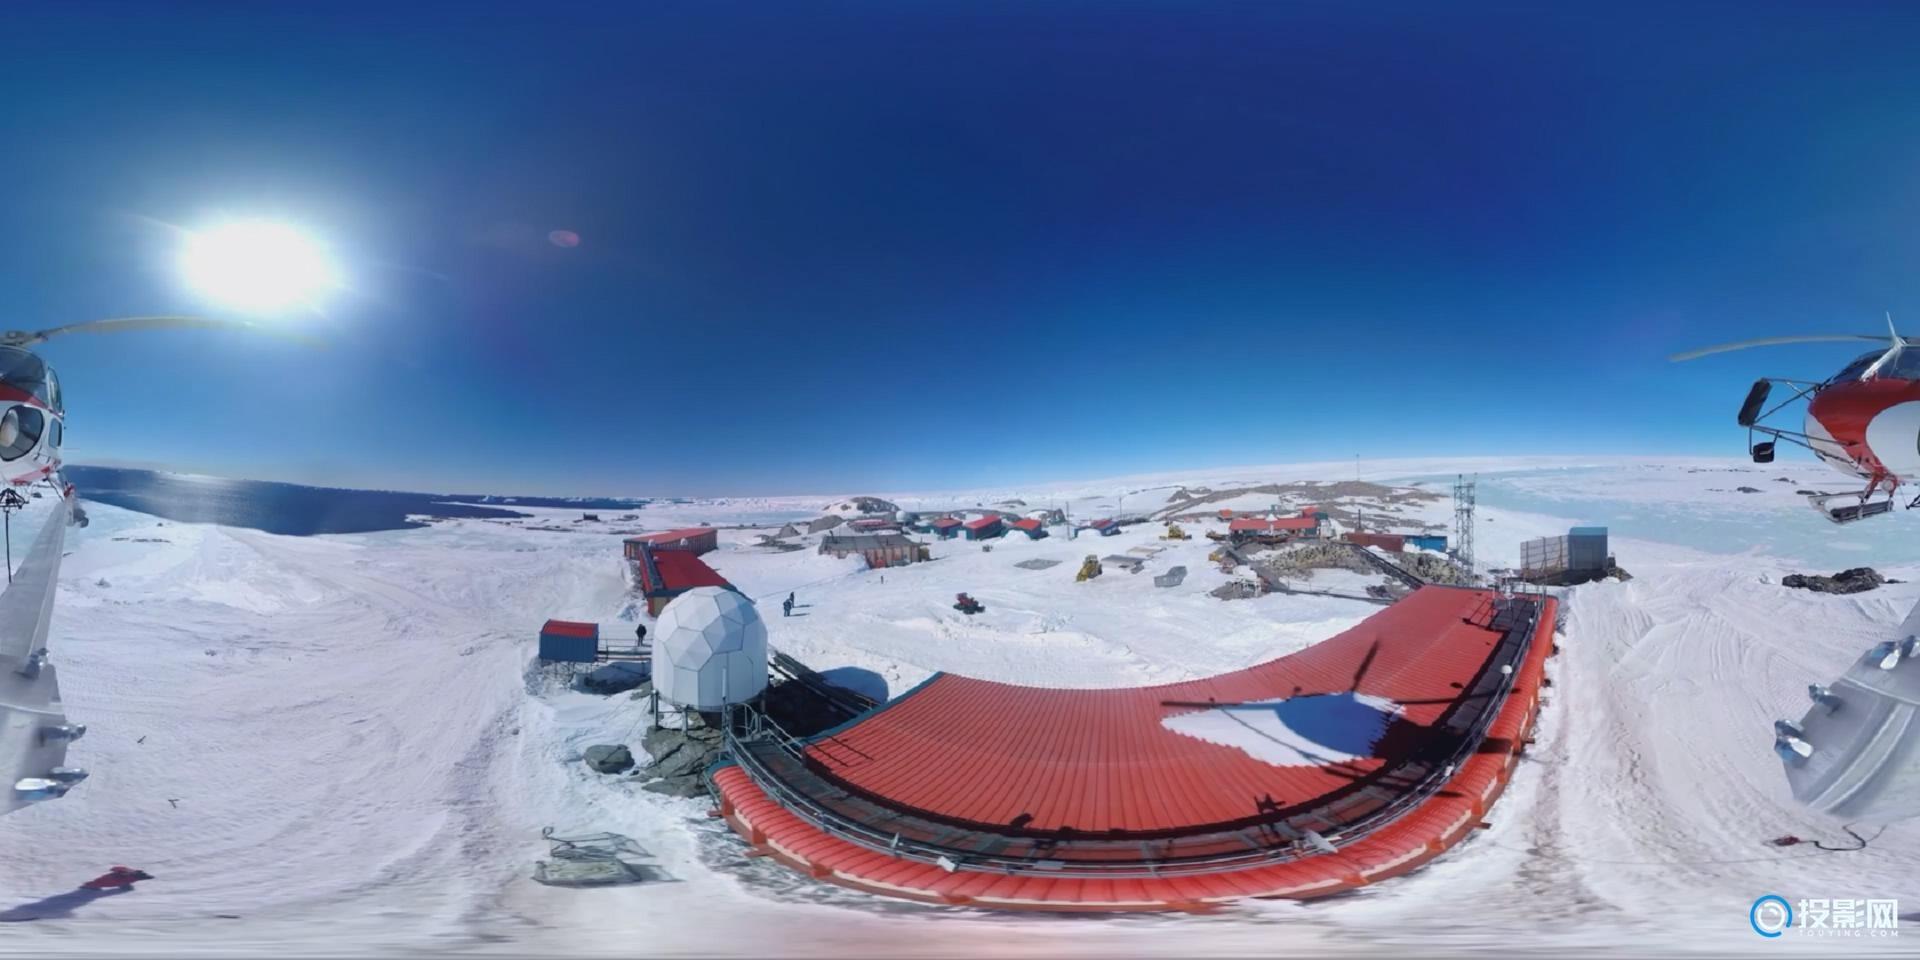 [VR360°全景] 抵达世界最纯净的地方—南极(第一集) VR视频